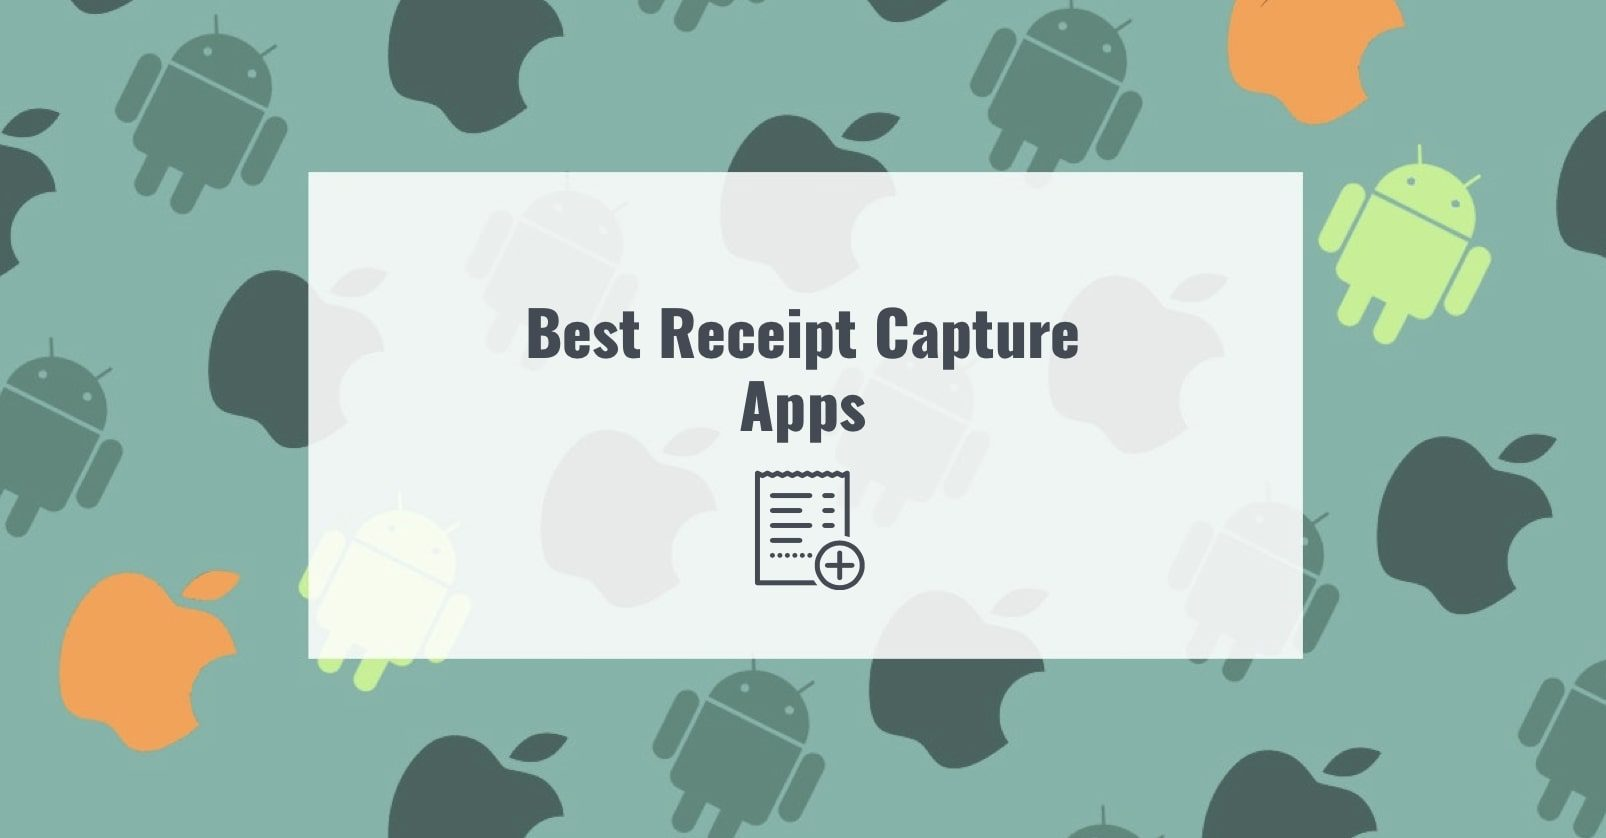 Best Receipt Capture Apps